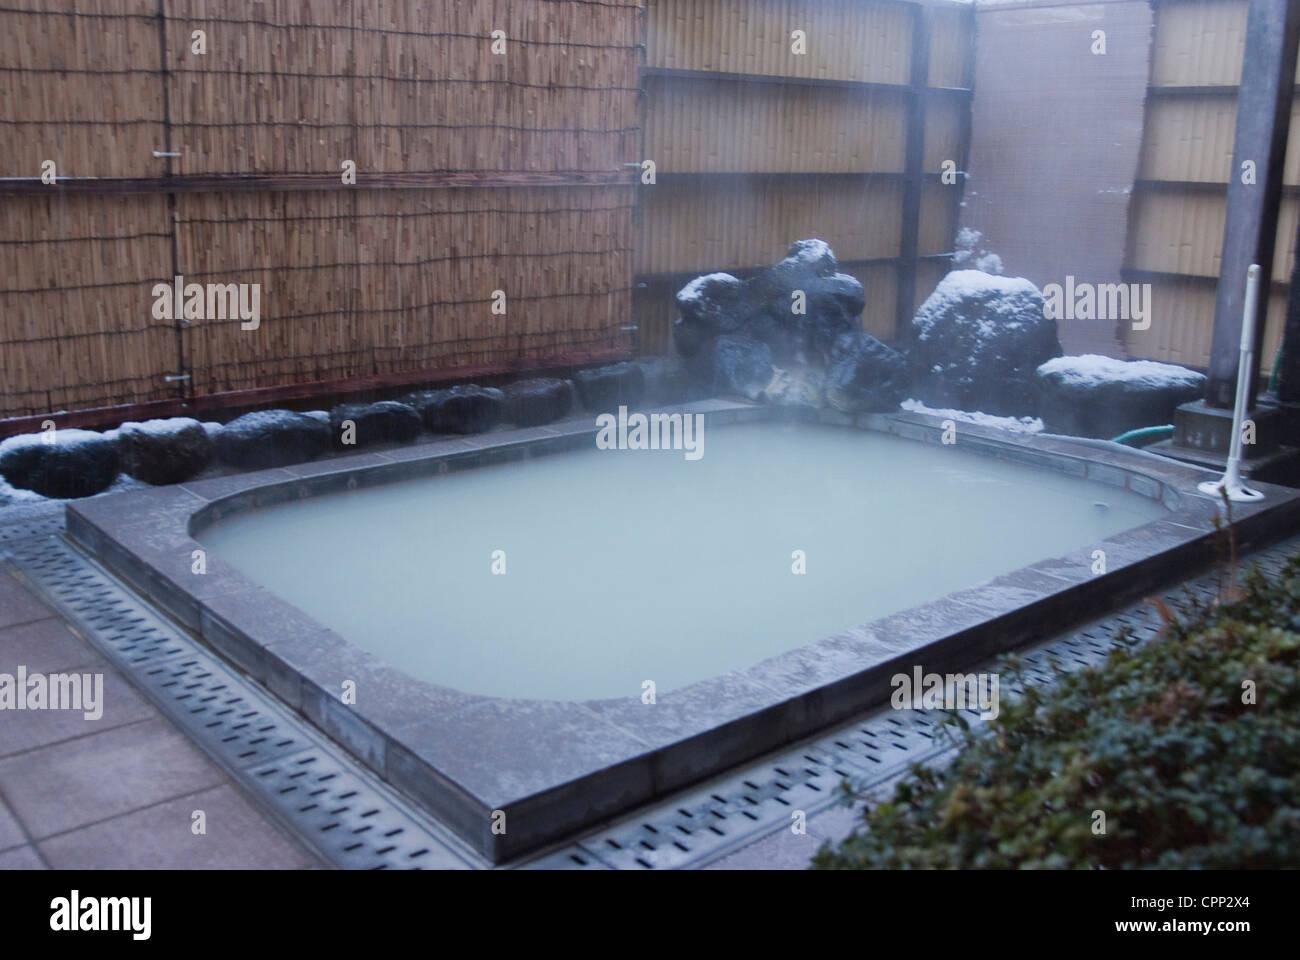 Japanese Man Bathing Stock Photos & Japanese Man Bathing Stock ...